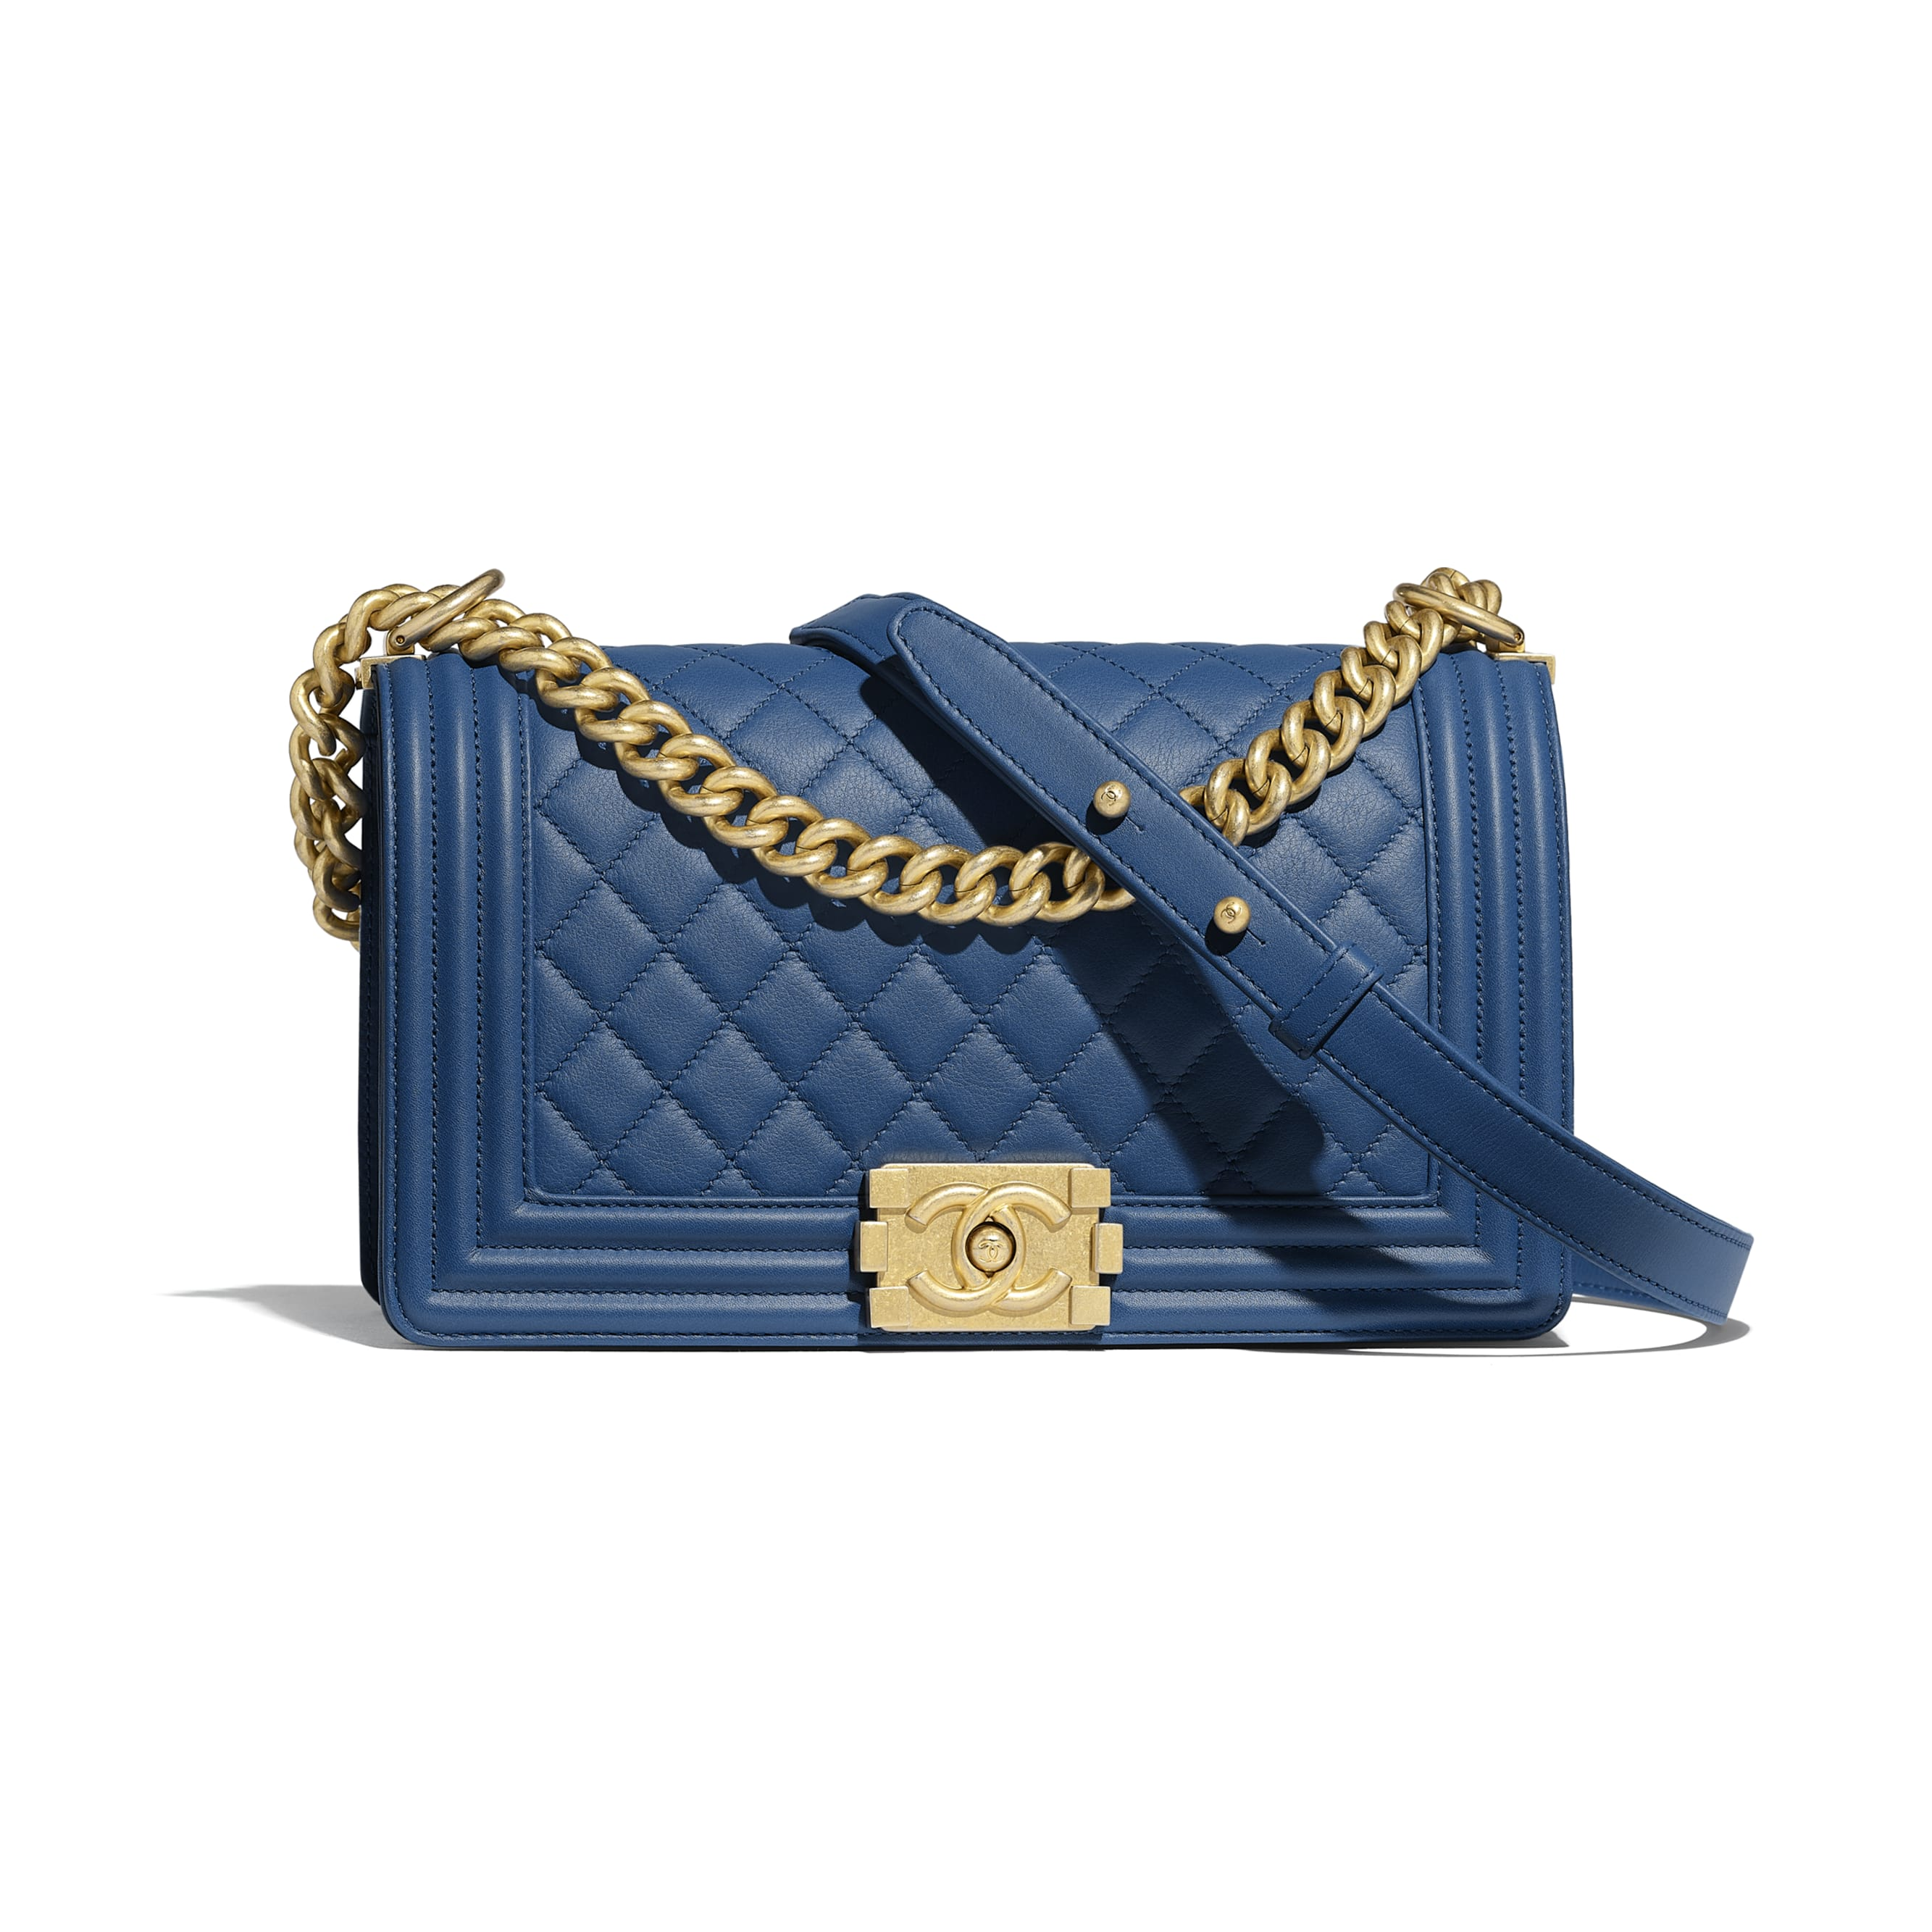 BOY CHANEL Handbag - Dark Blue - Calfskin & Gold-Tone Metal - Default view - see standard sized version